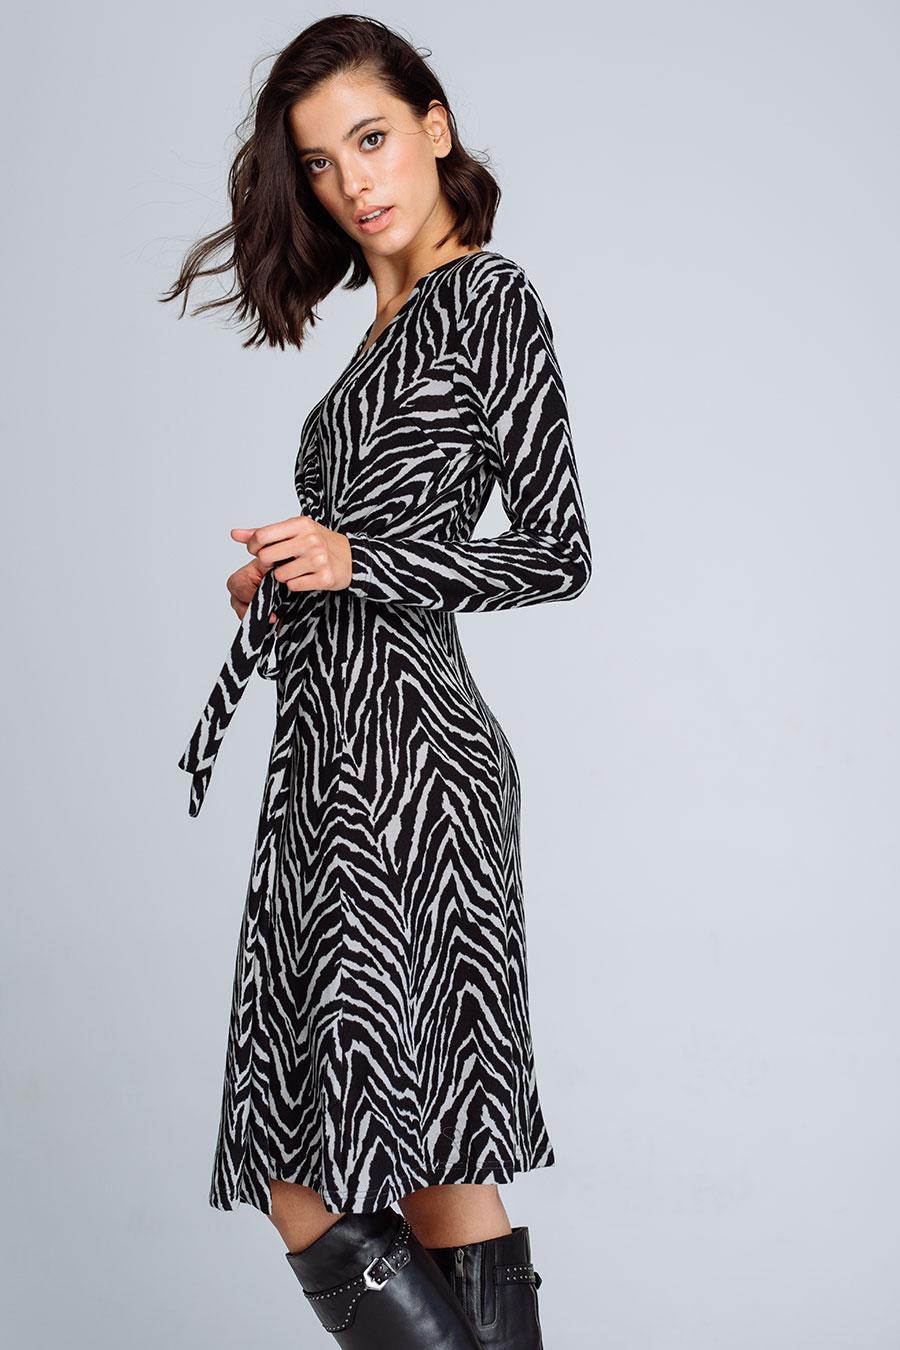 Online Shop Jagger Brand Zenska Haljina Jg 5480 01 05 Jesen Zima 2020 2021 03